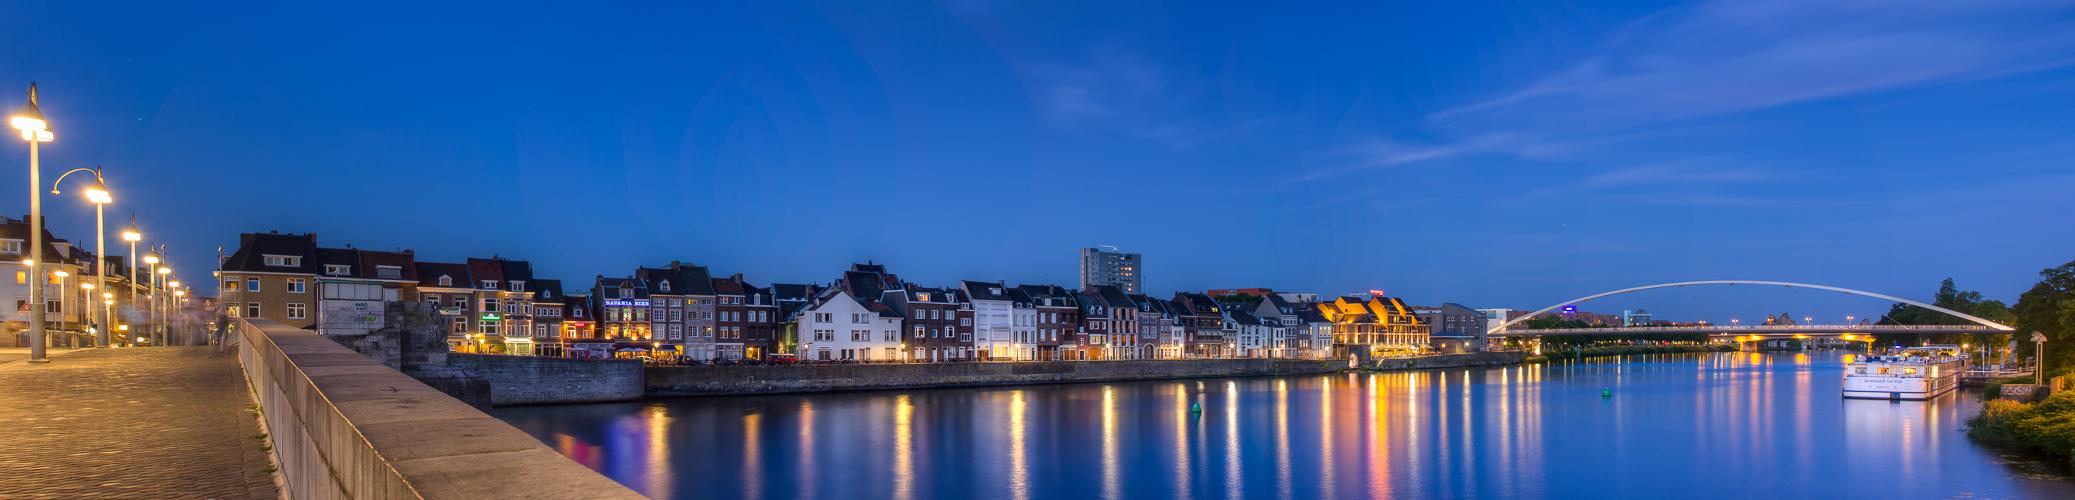 Maastricht-Panorama